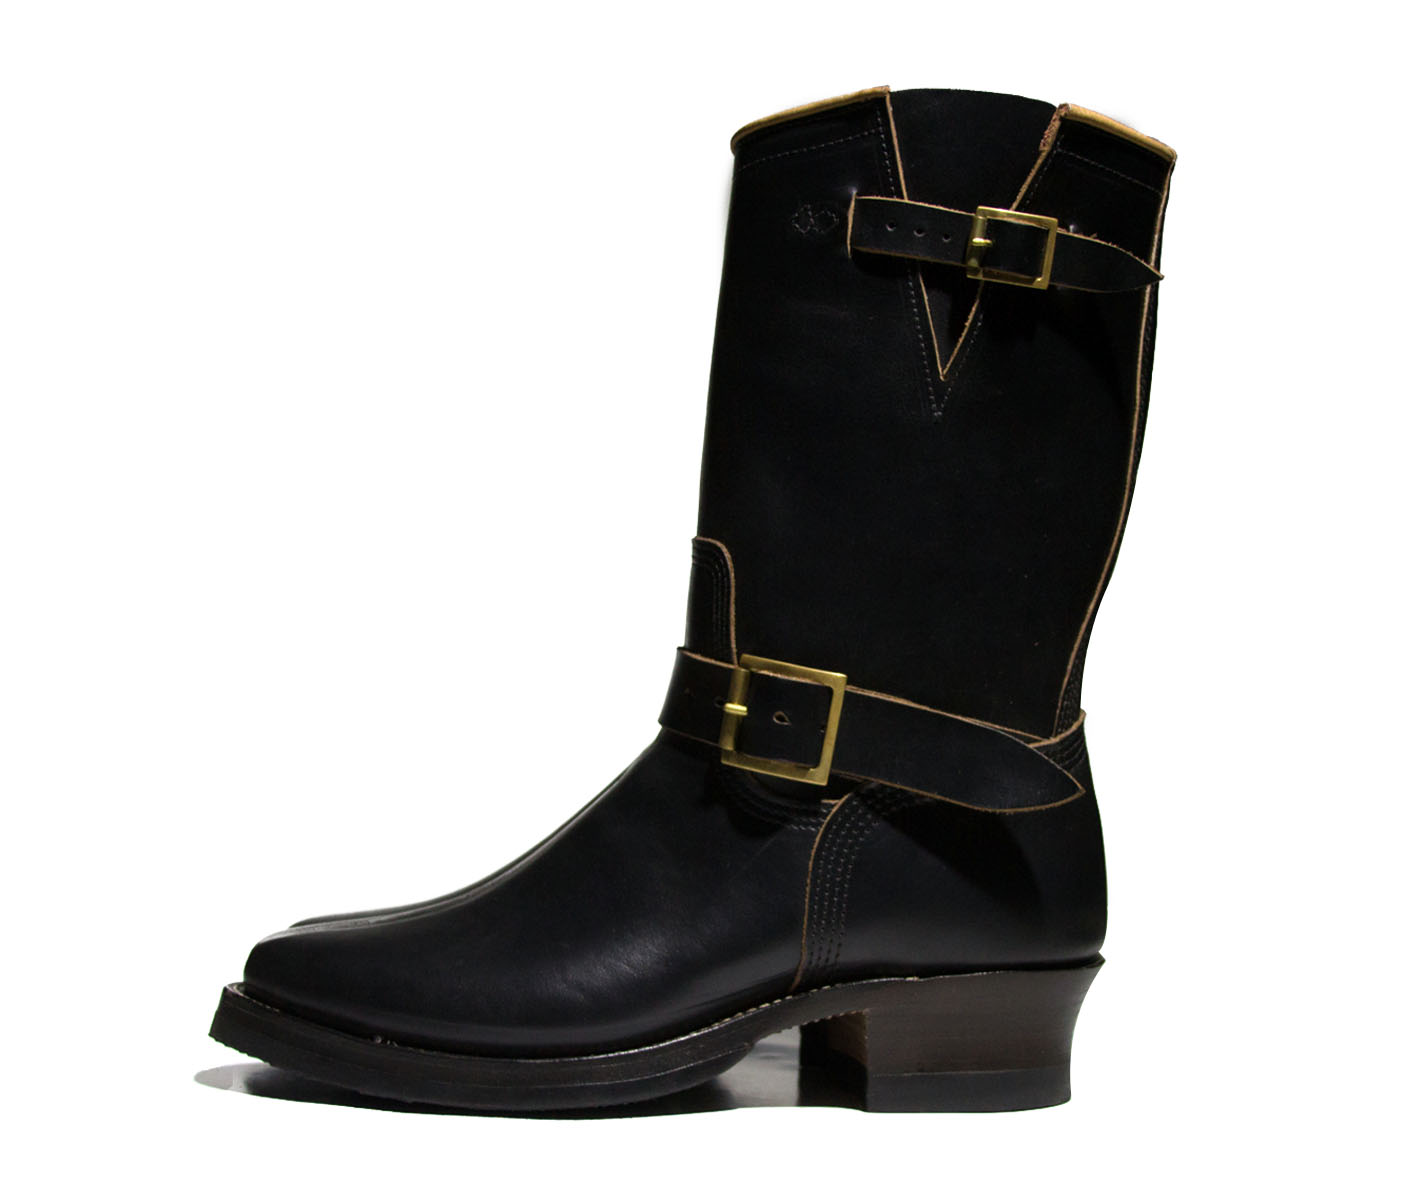 black boot profile.jpg